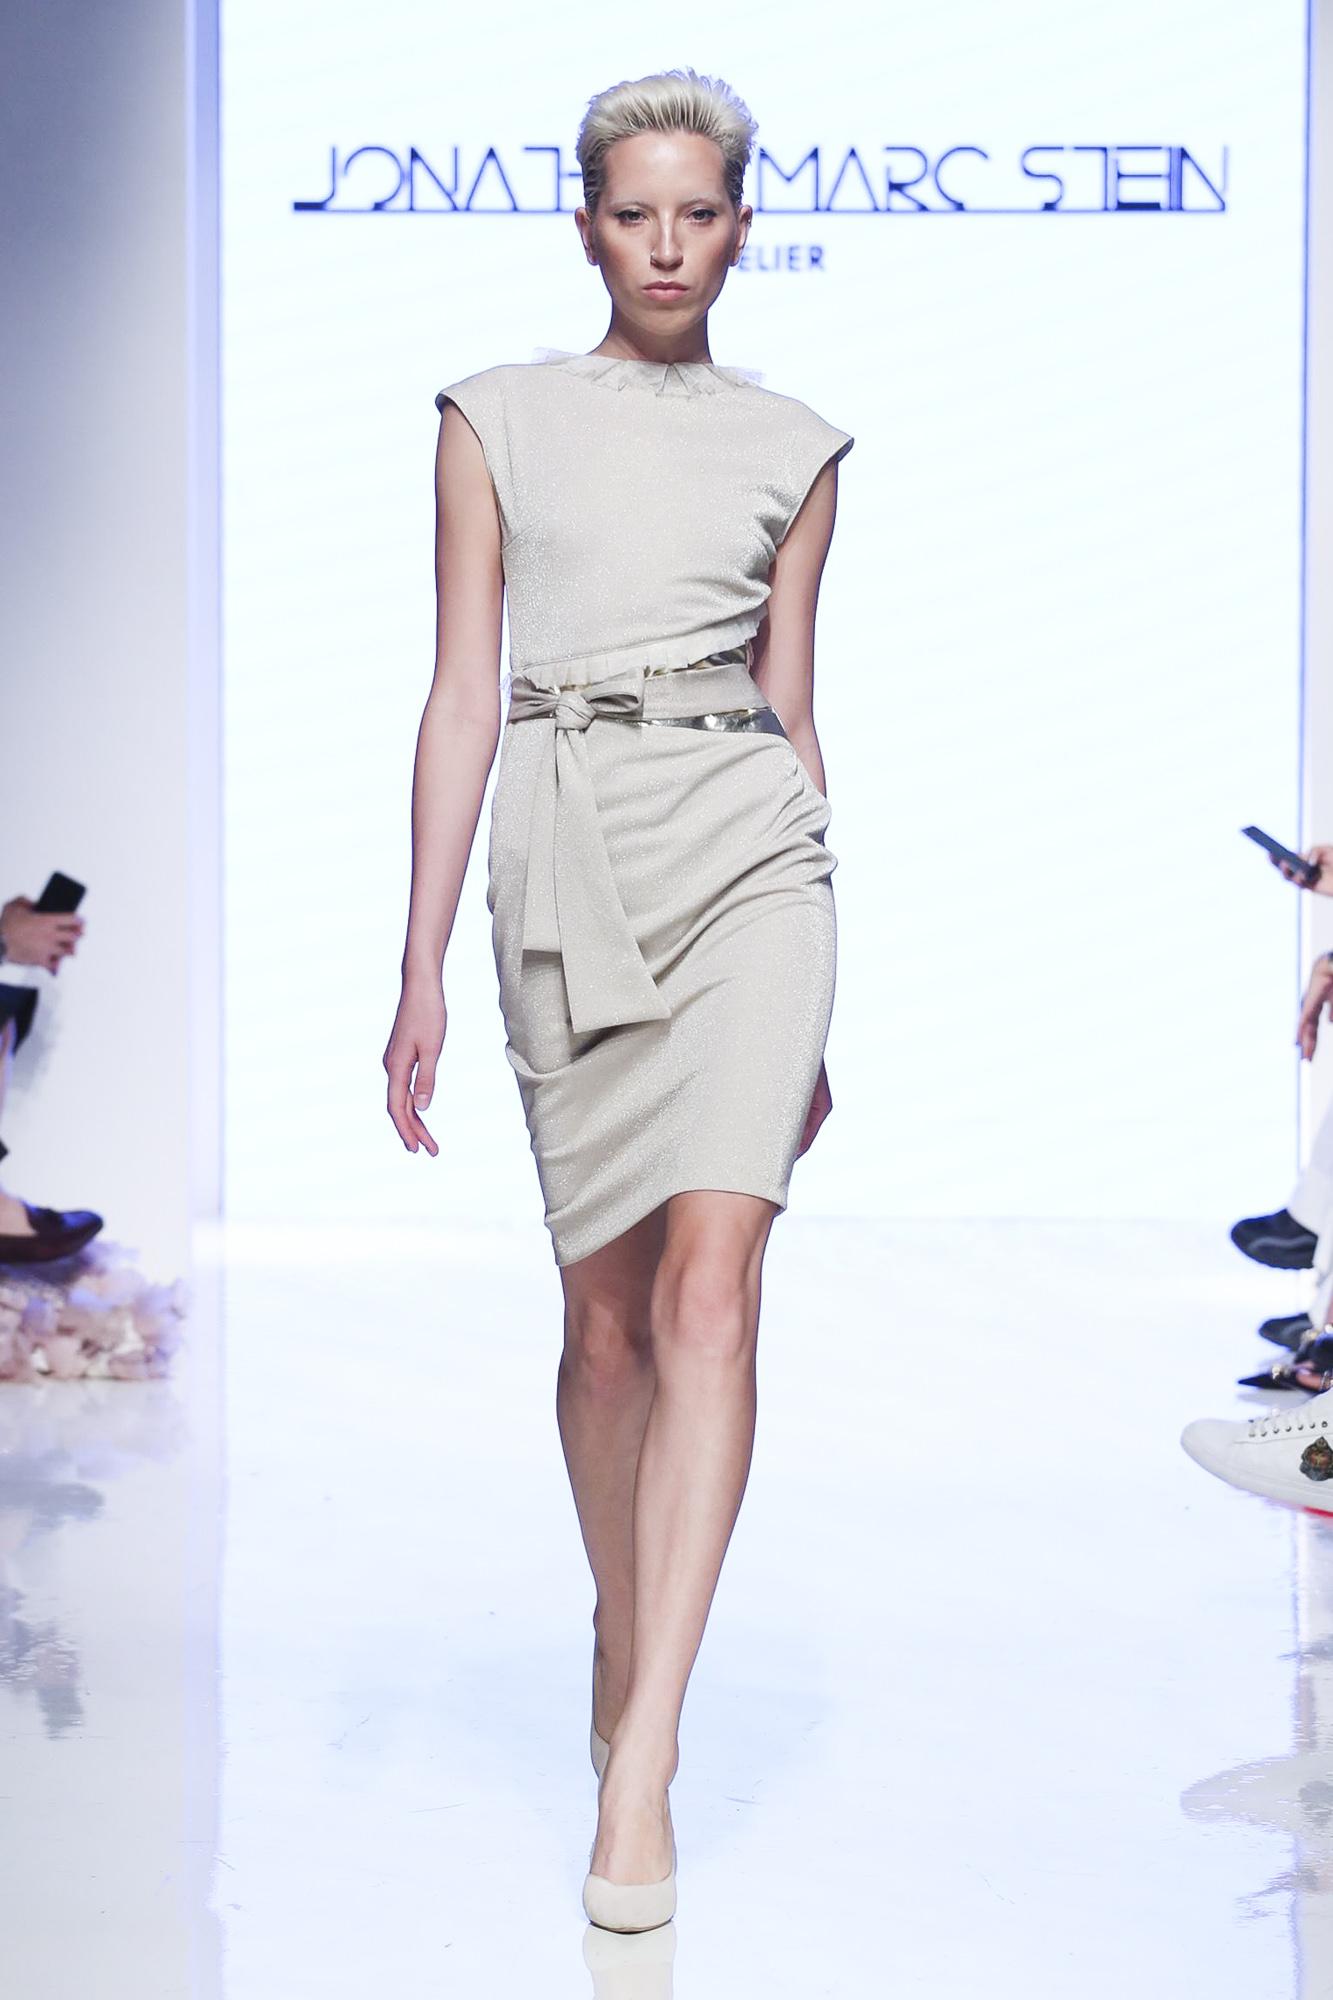 Jonathan Marc Stein fashion show, Arab Fashion Week collection Spring Summer 2020 in Dubai